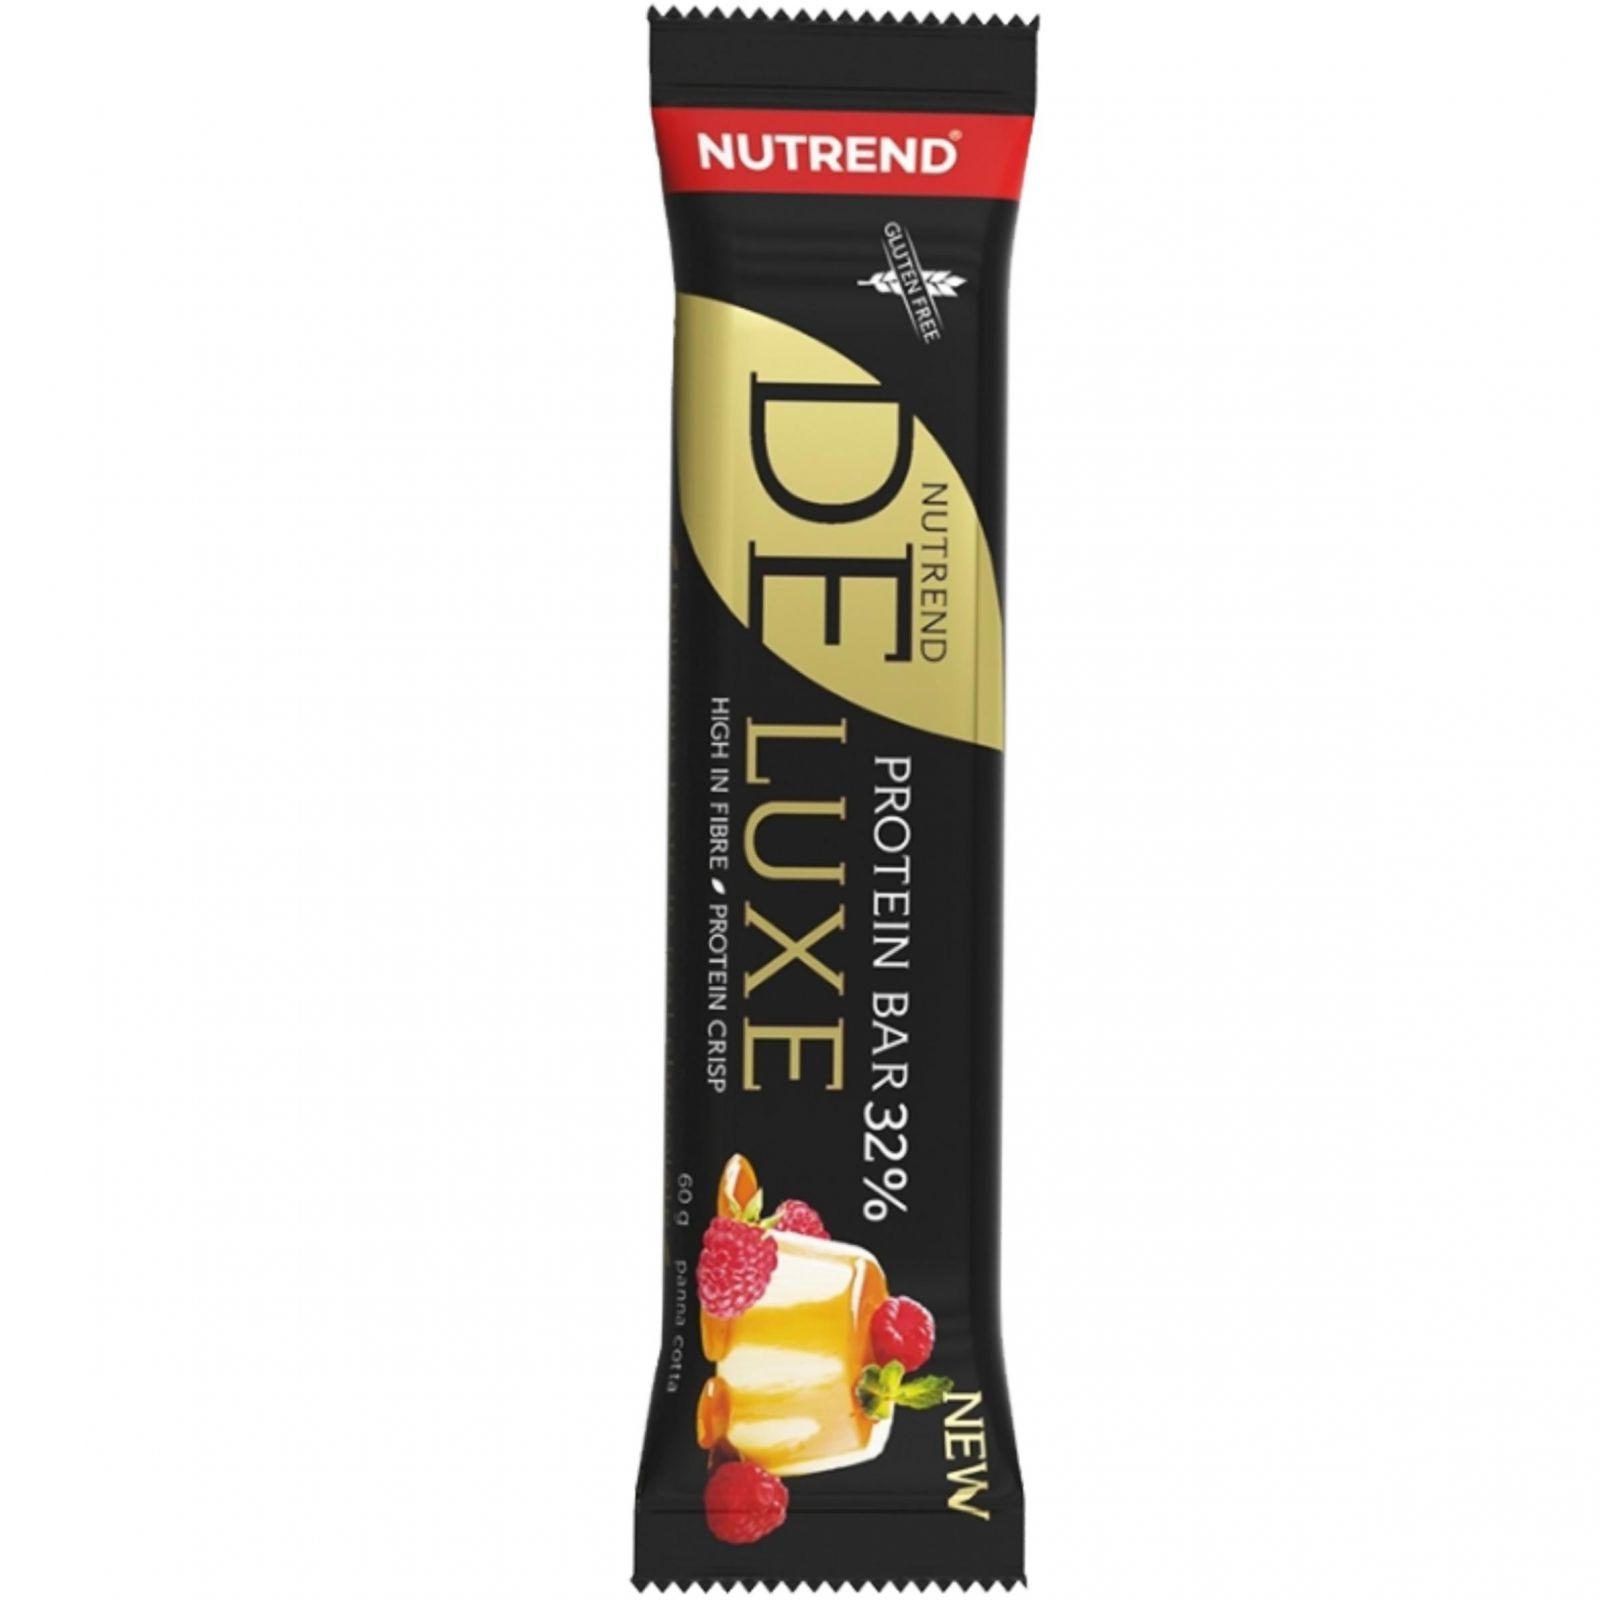 Nutrend Deluxe Protein Bar 60 g - panna cotta